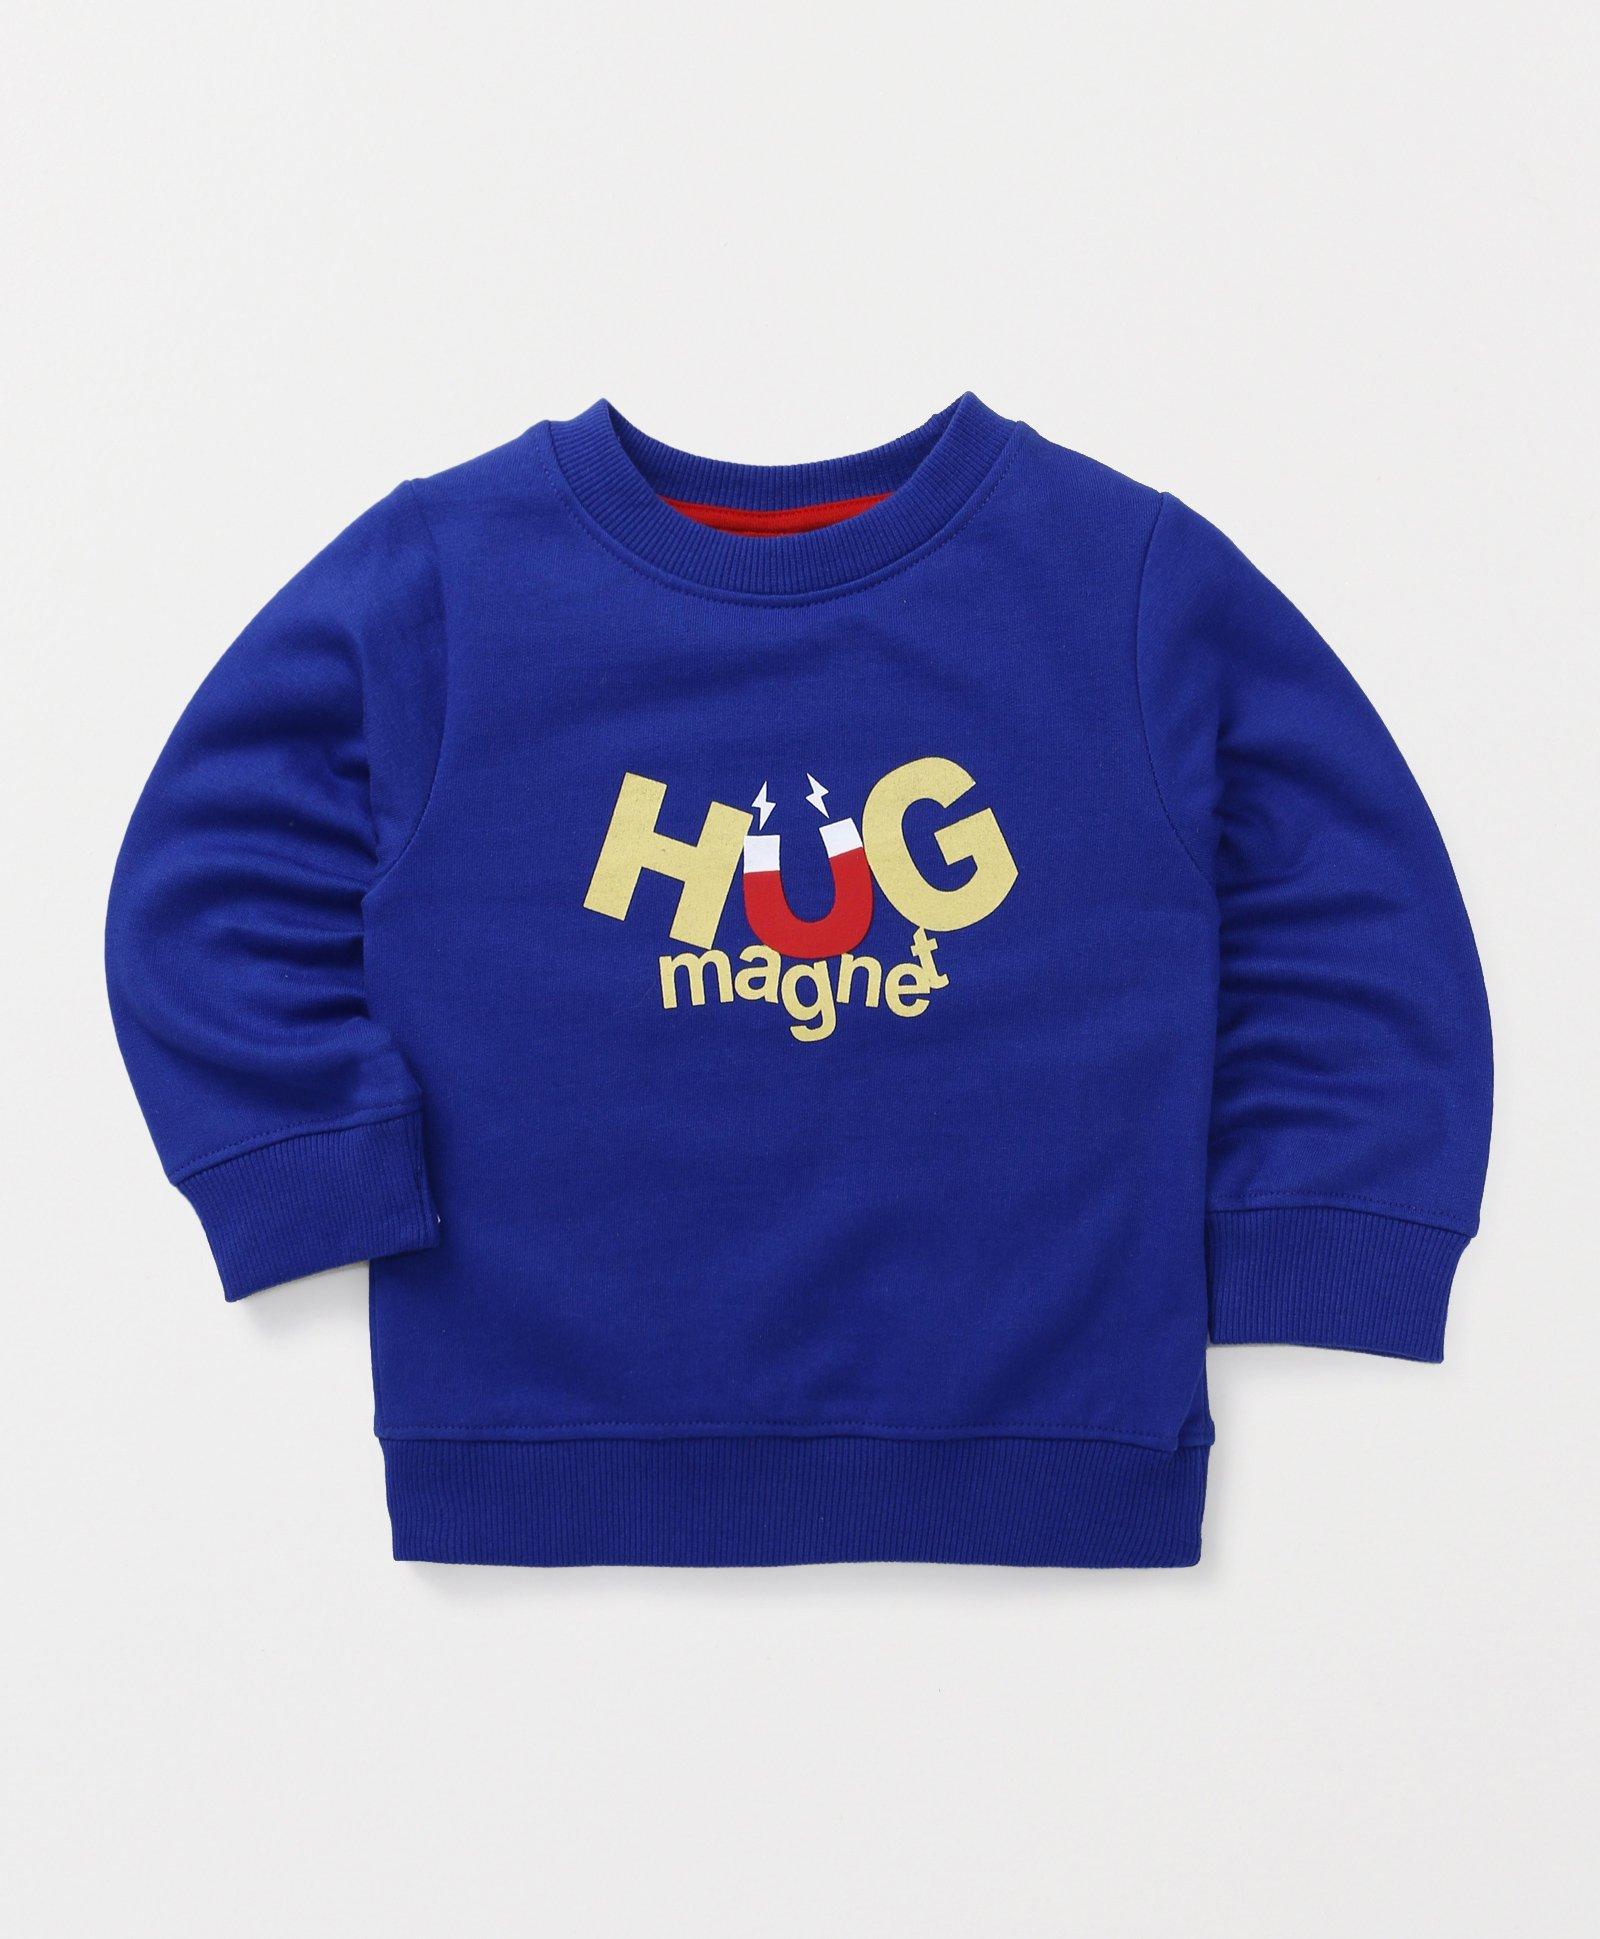 Babyhug Full Sleeves Pullover Sweatshirt Hug Magnet Print - Blue